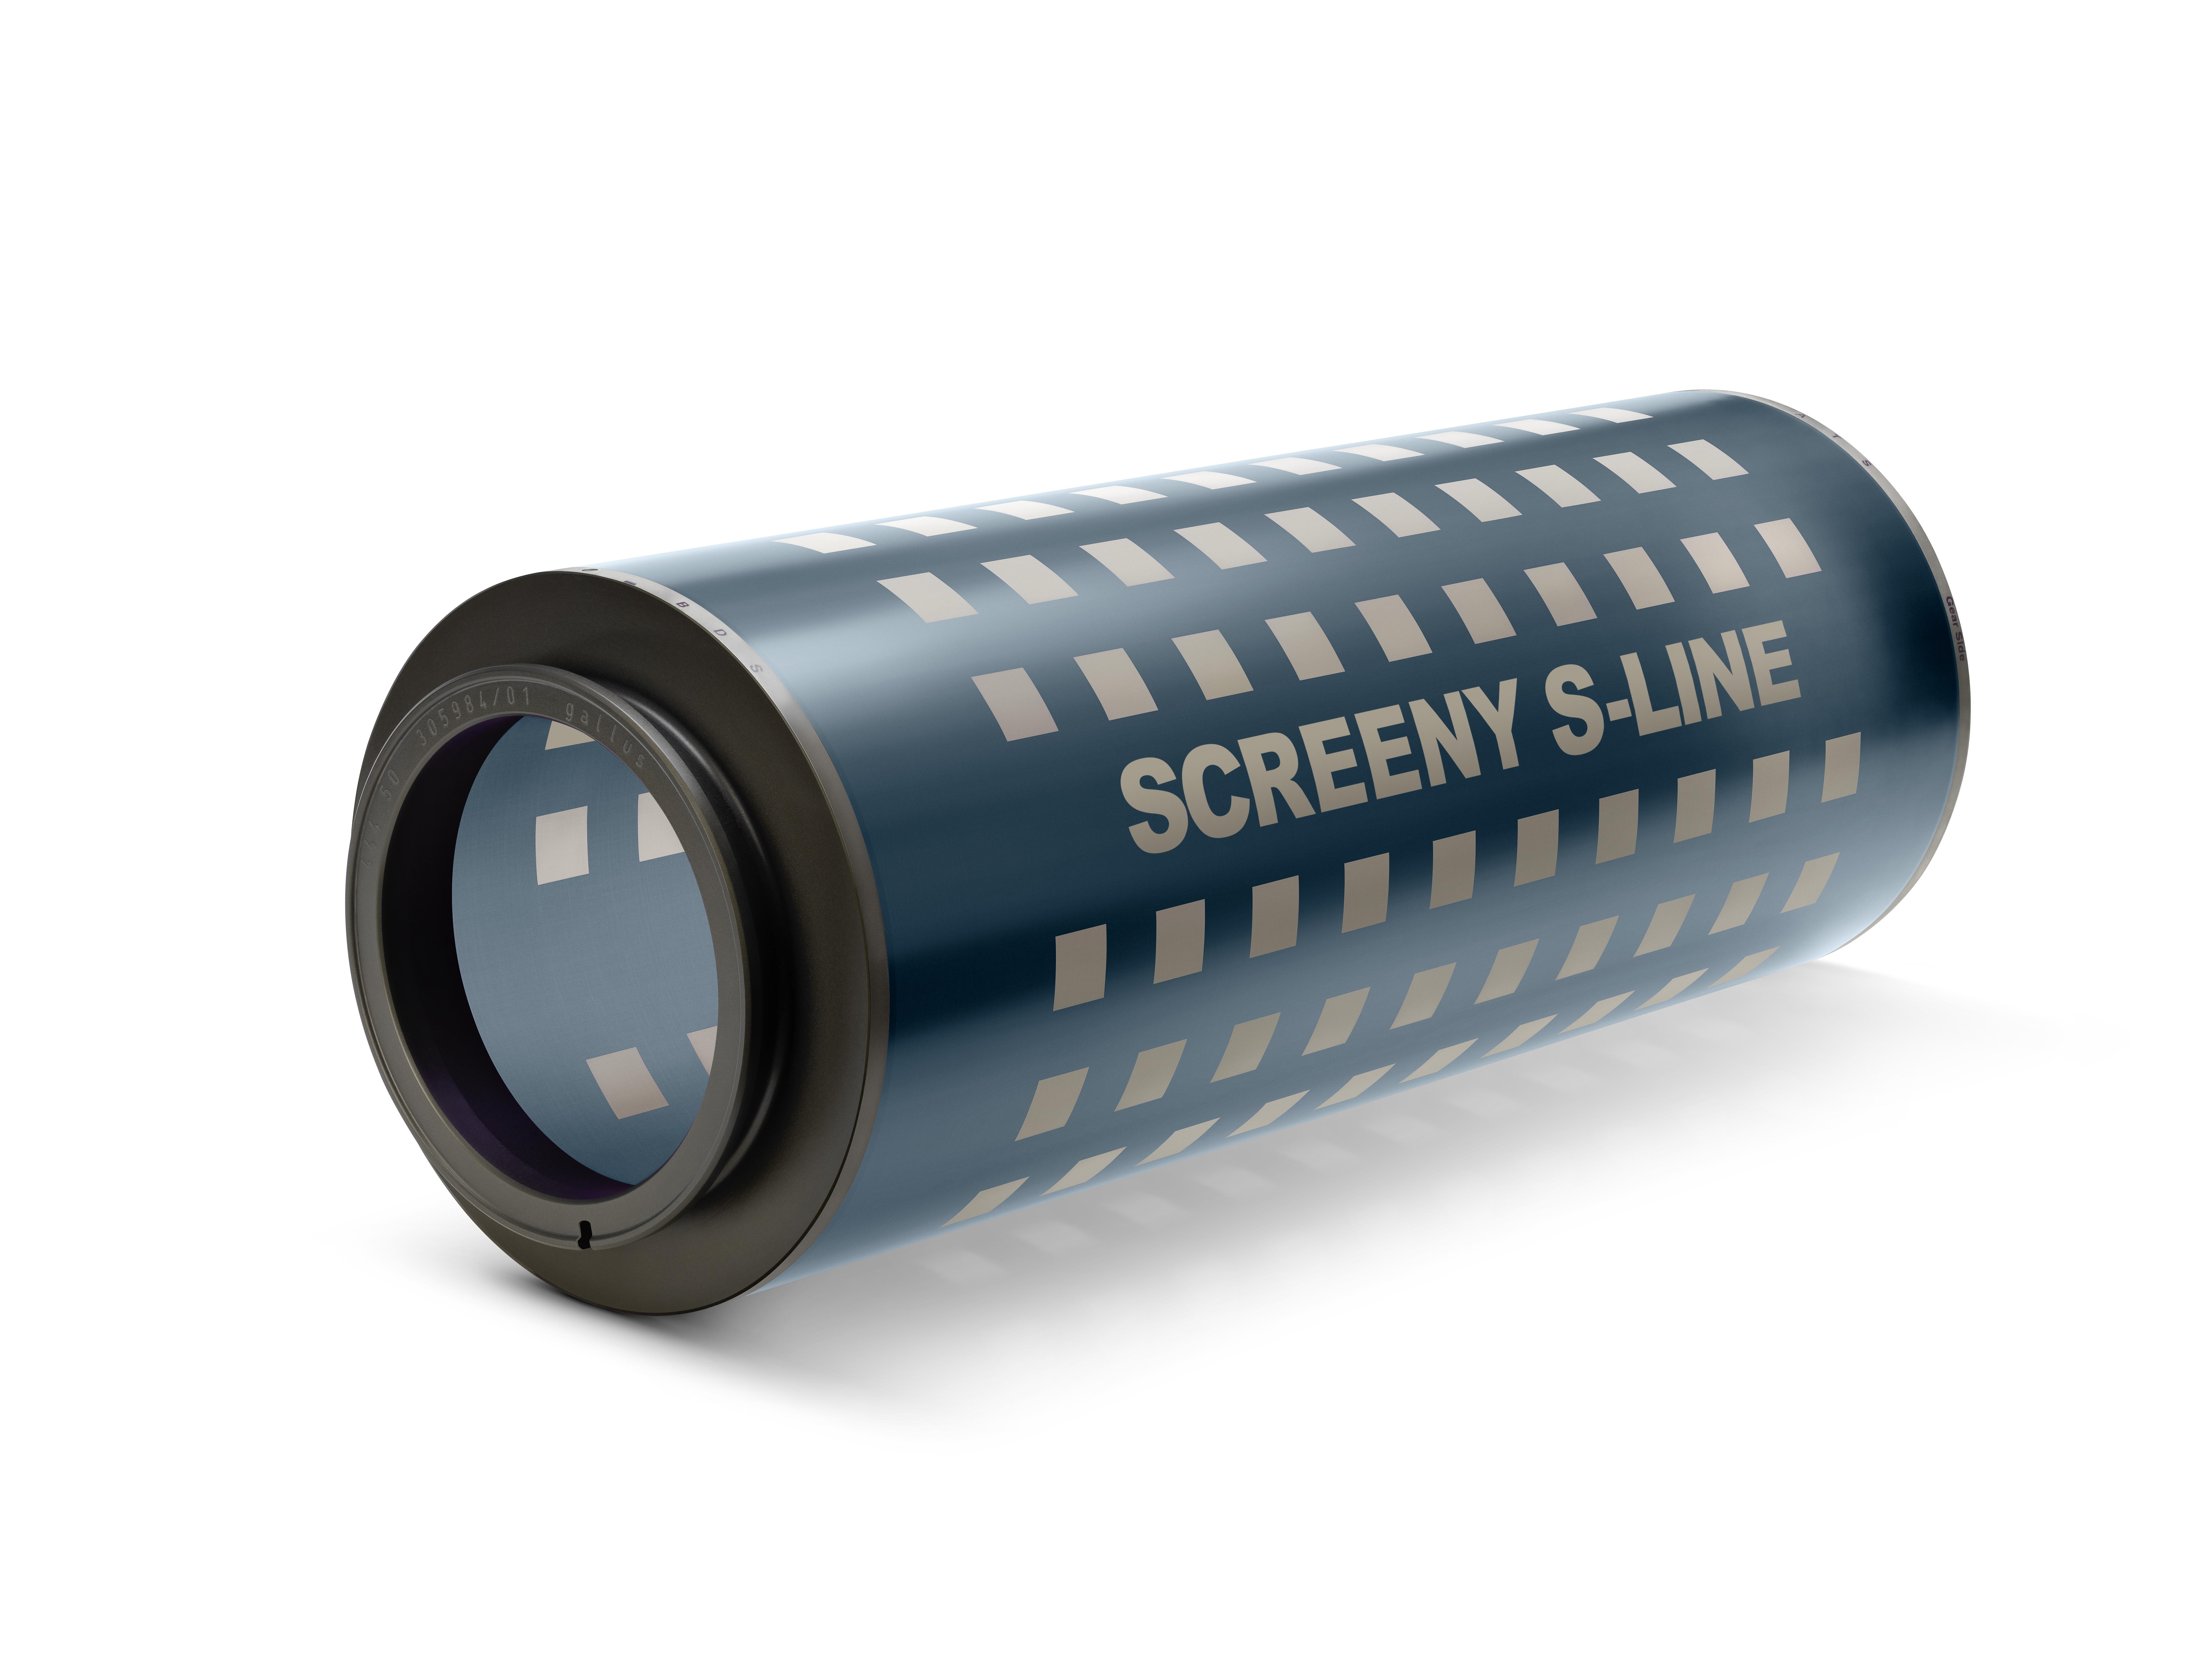 2_screeny_s-line_schatten